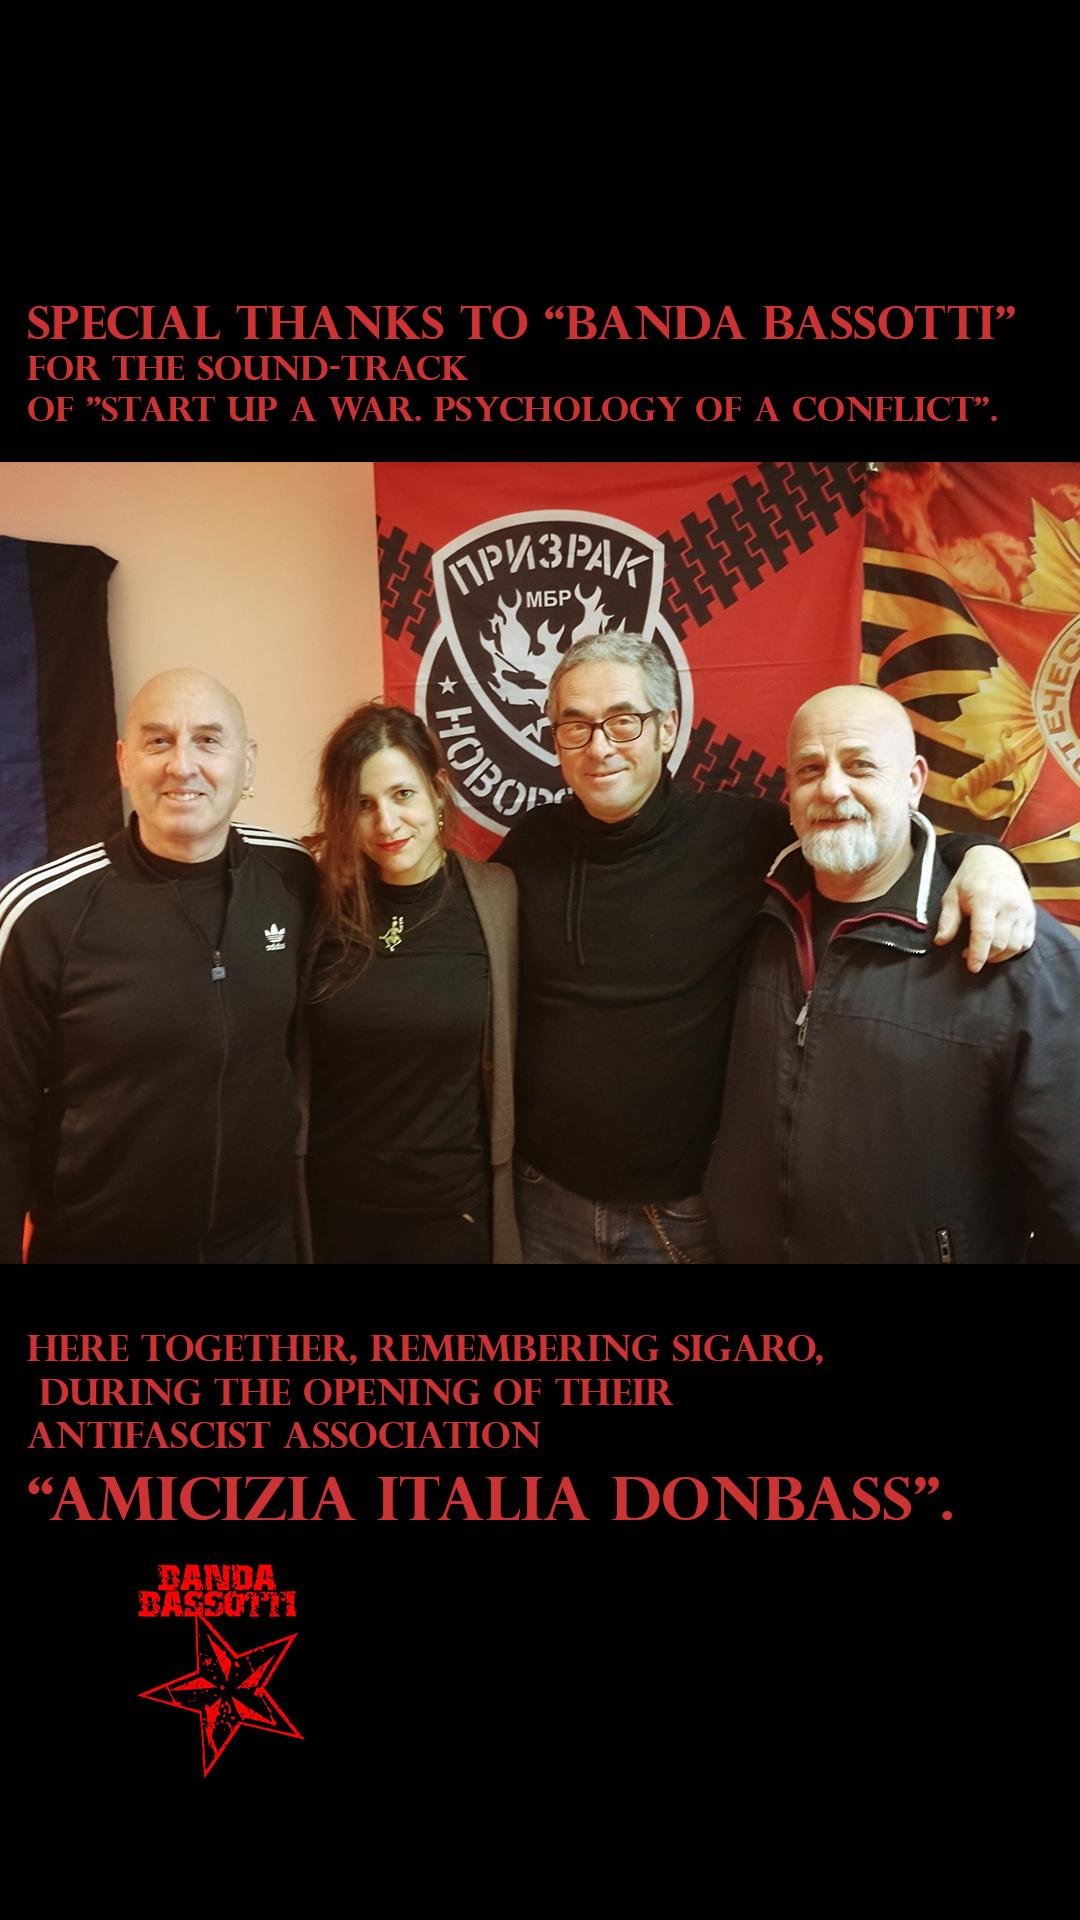 Sara Reginella | Banda Bassotti Antifascist Association Amicizia Italia Donbass